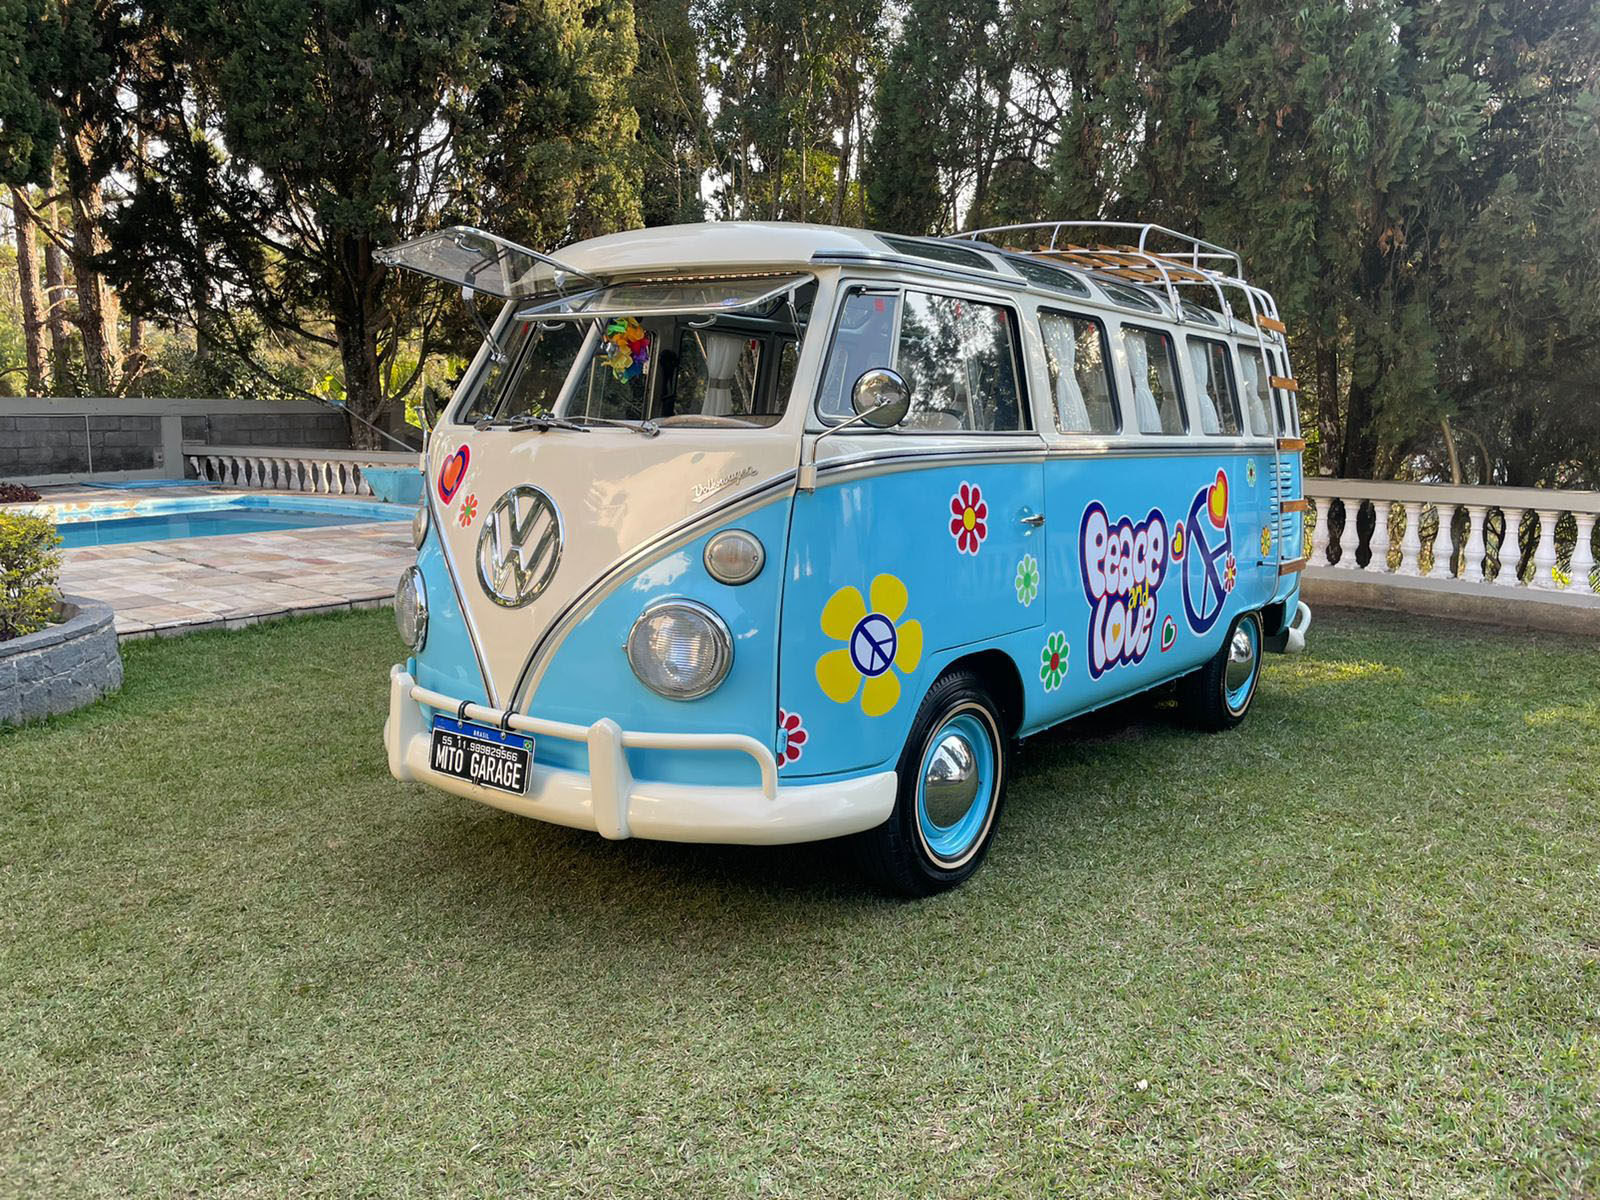 VW Kombi T1 Samba (Réplica) Hippie Style Caiçara Blue and White 1975